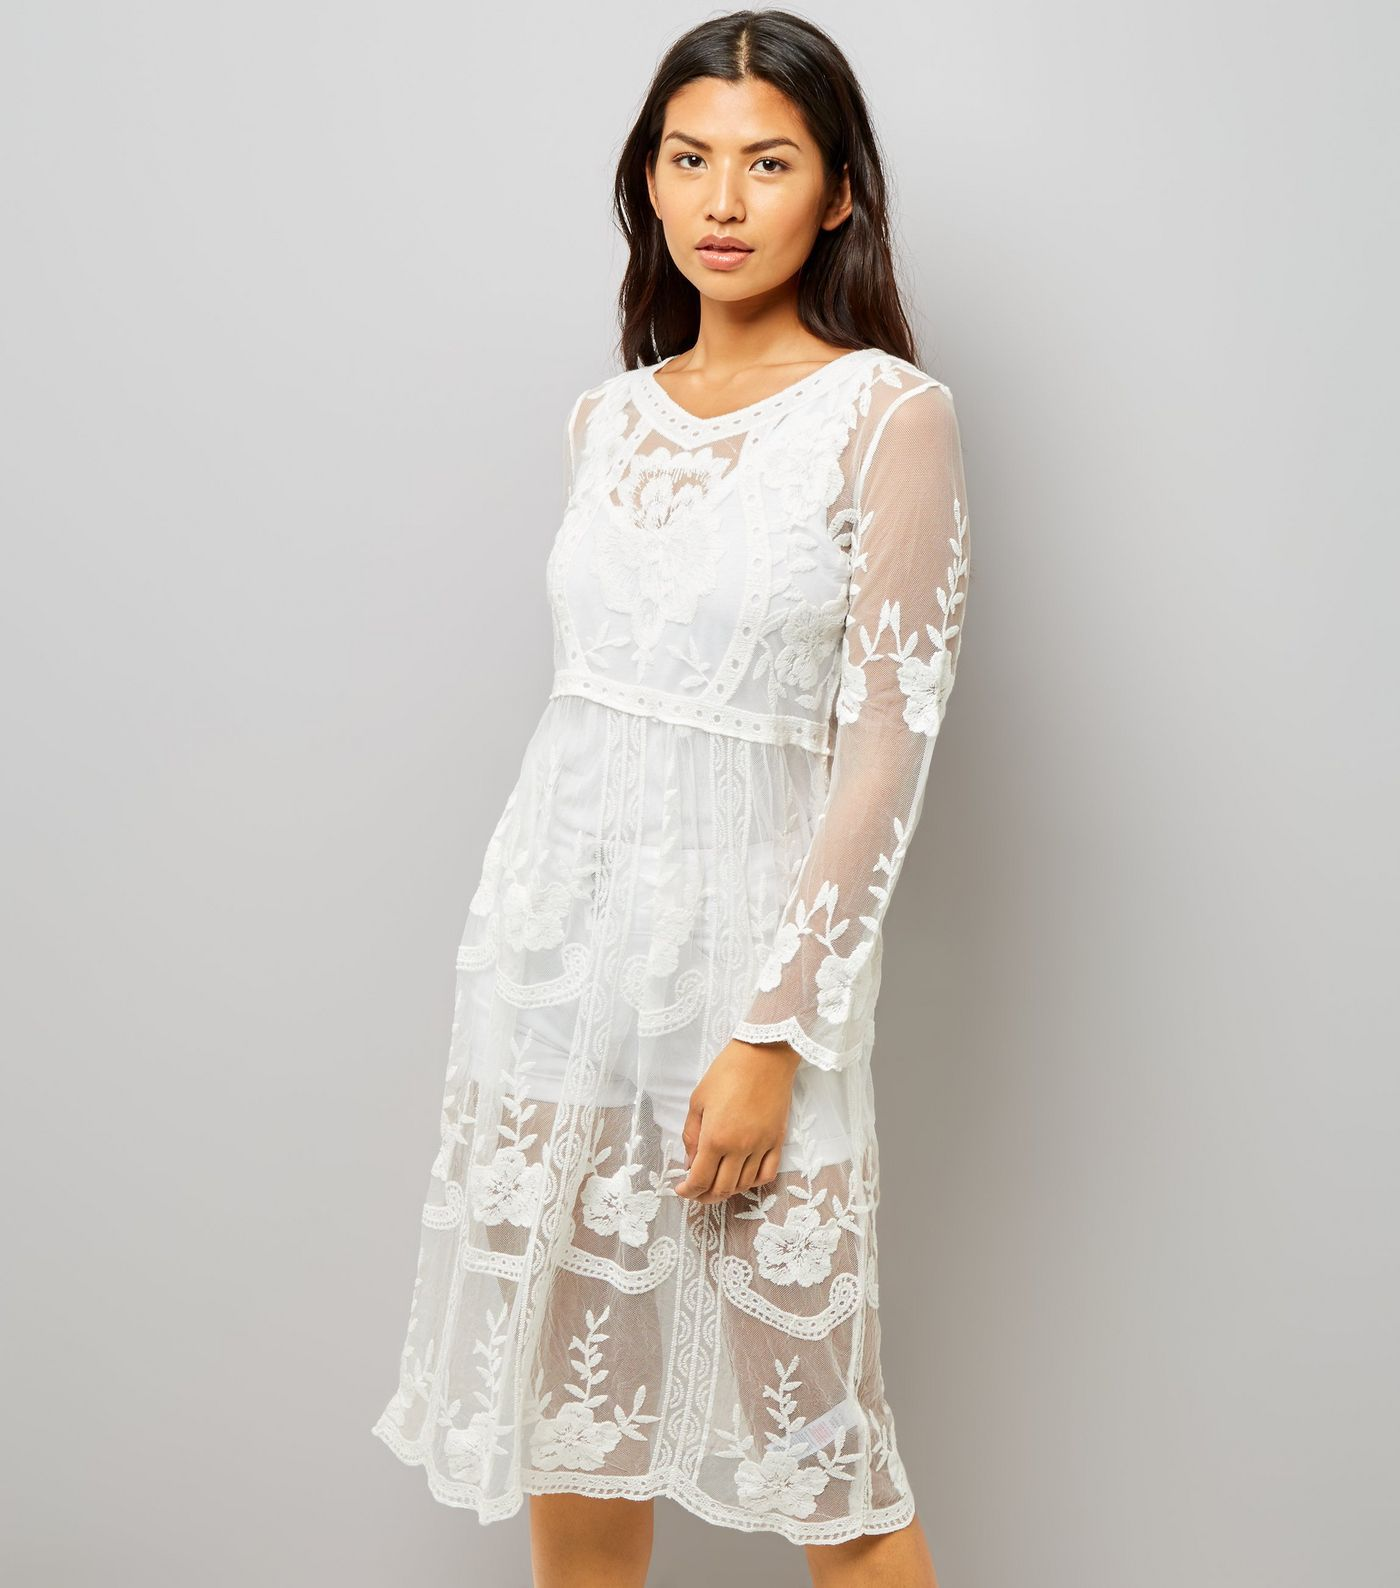 Robe patineuse mi-longue blanche en dentelle au crochet   Wedding ... 1373fa583fb